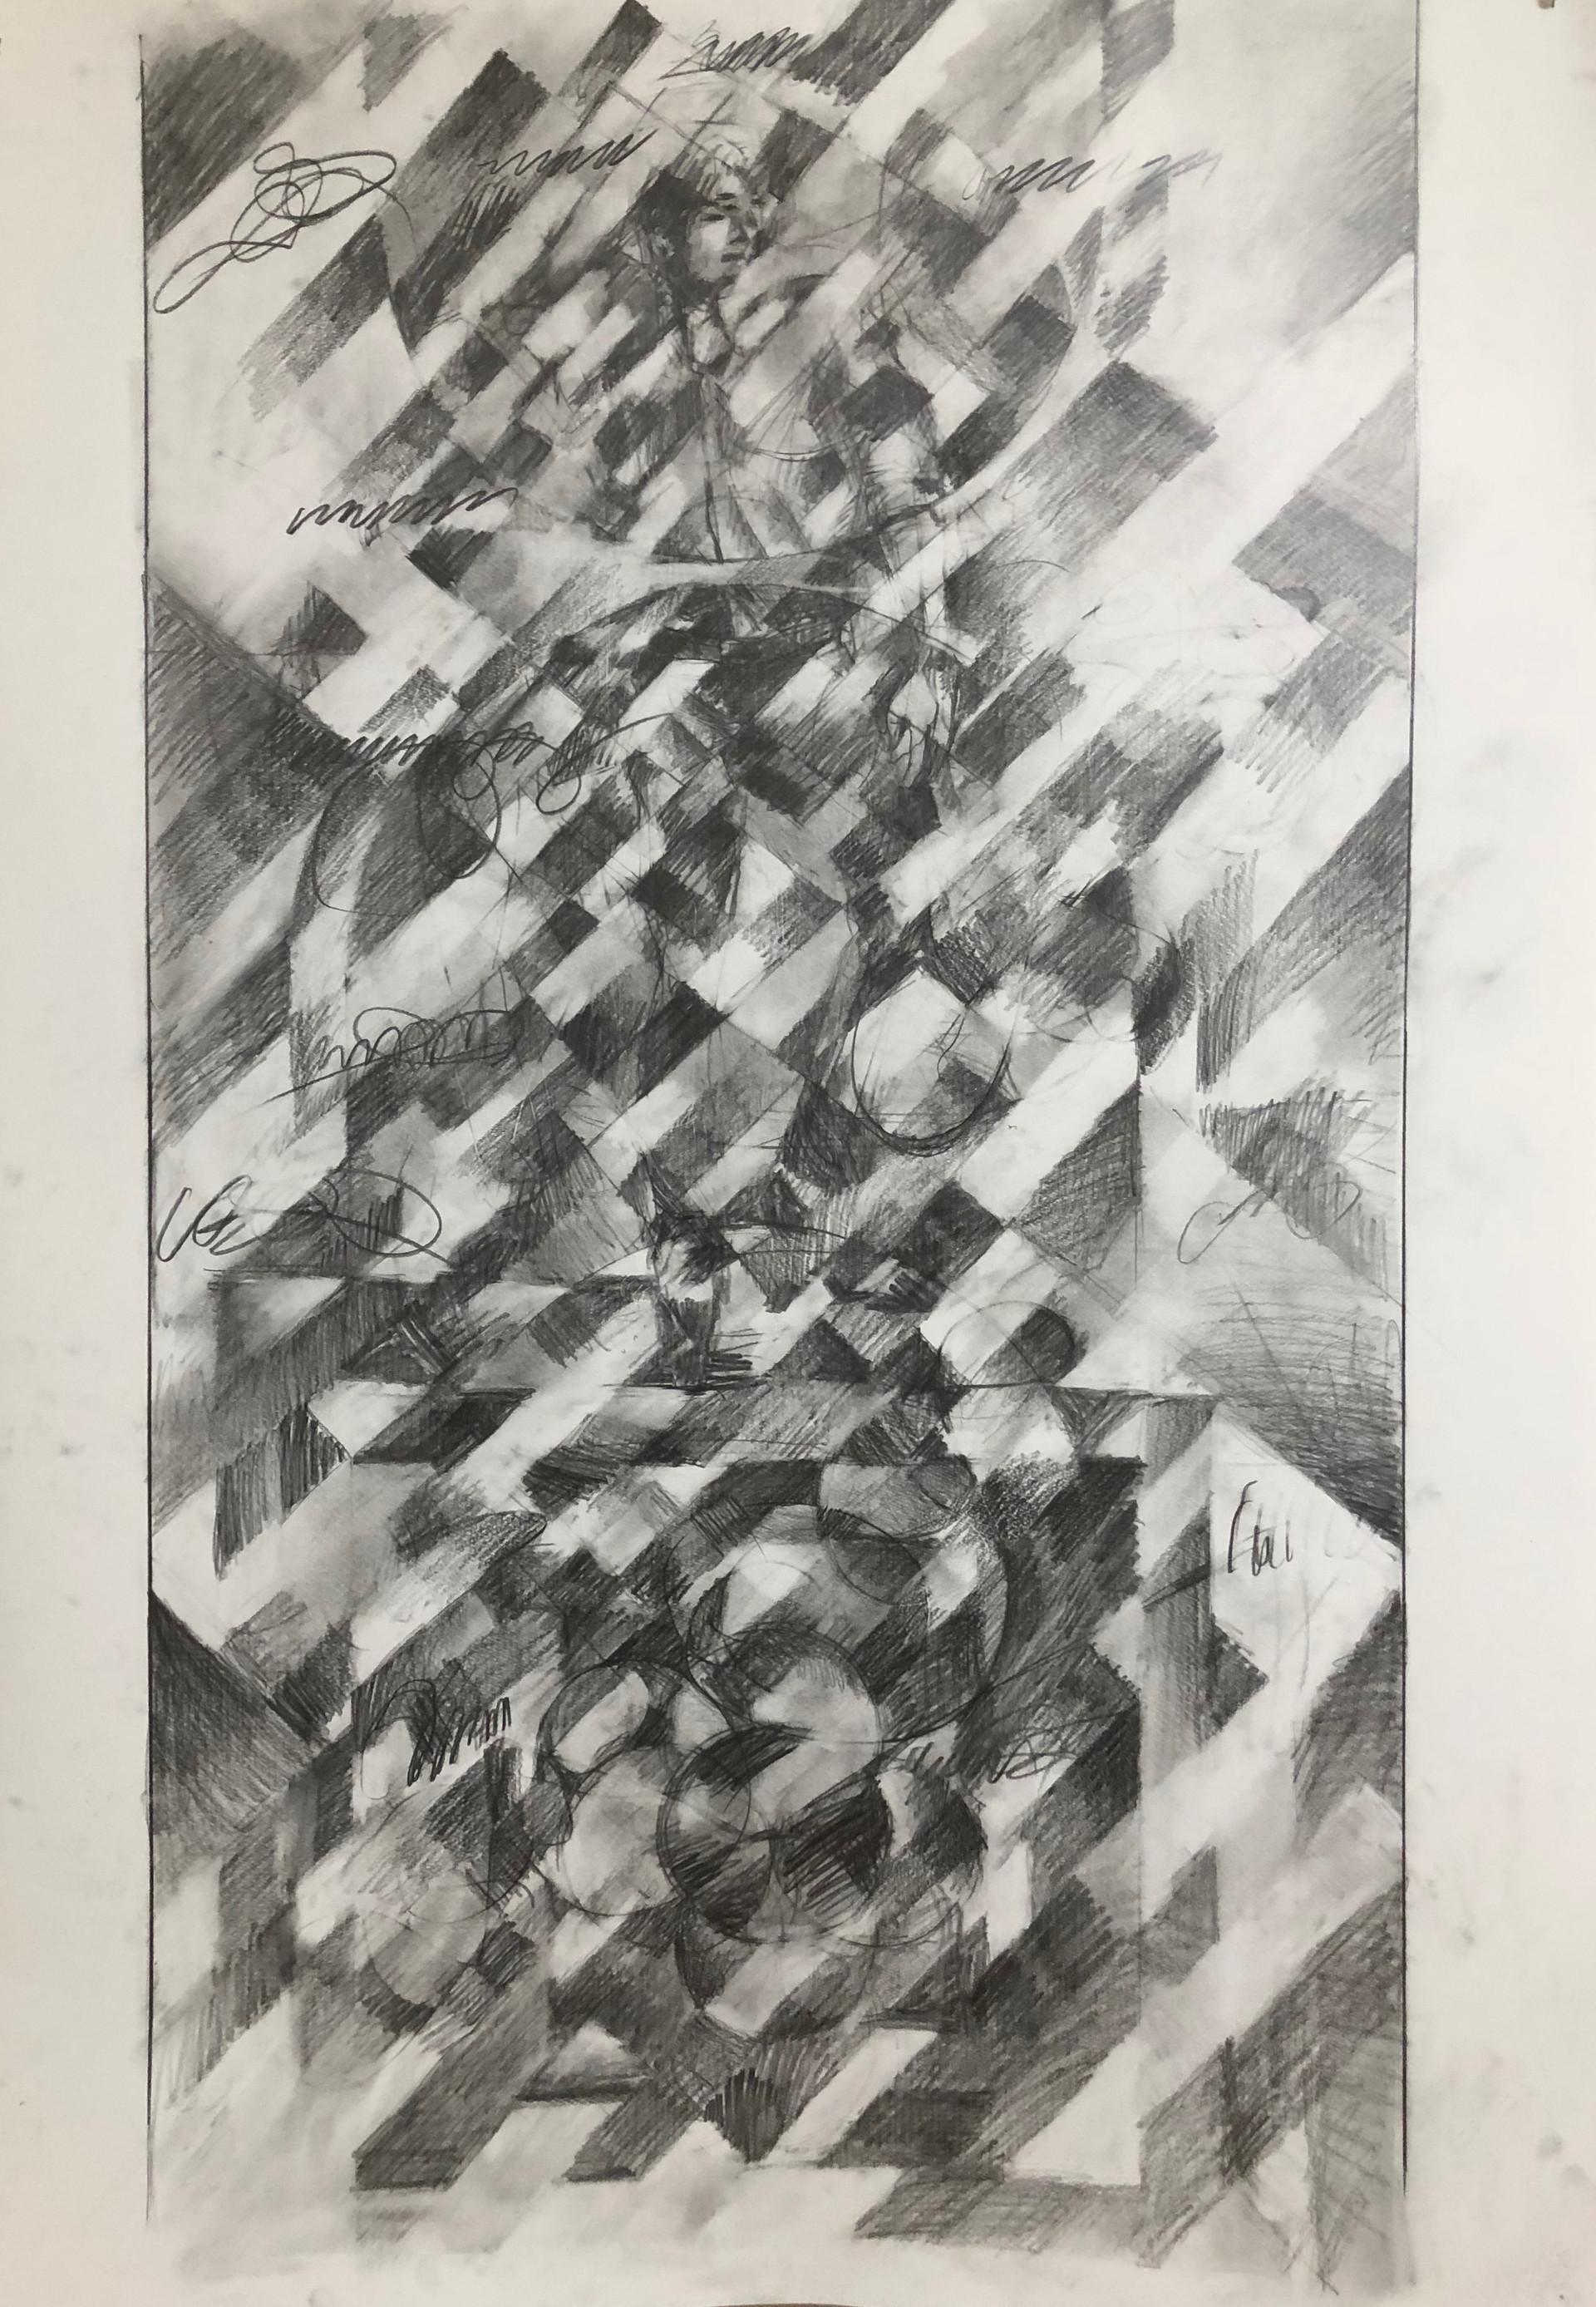 重力3 | 鉛筆、紙 1456mm ☓ 1030mm  | 2018